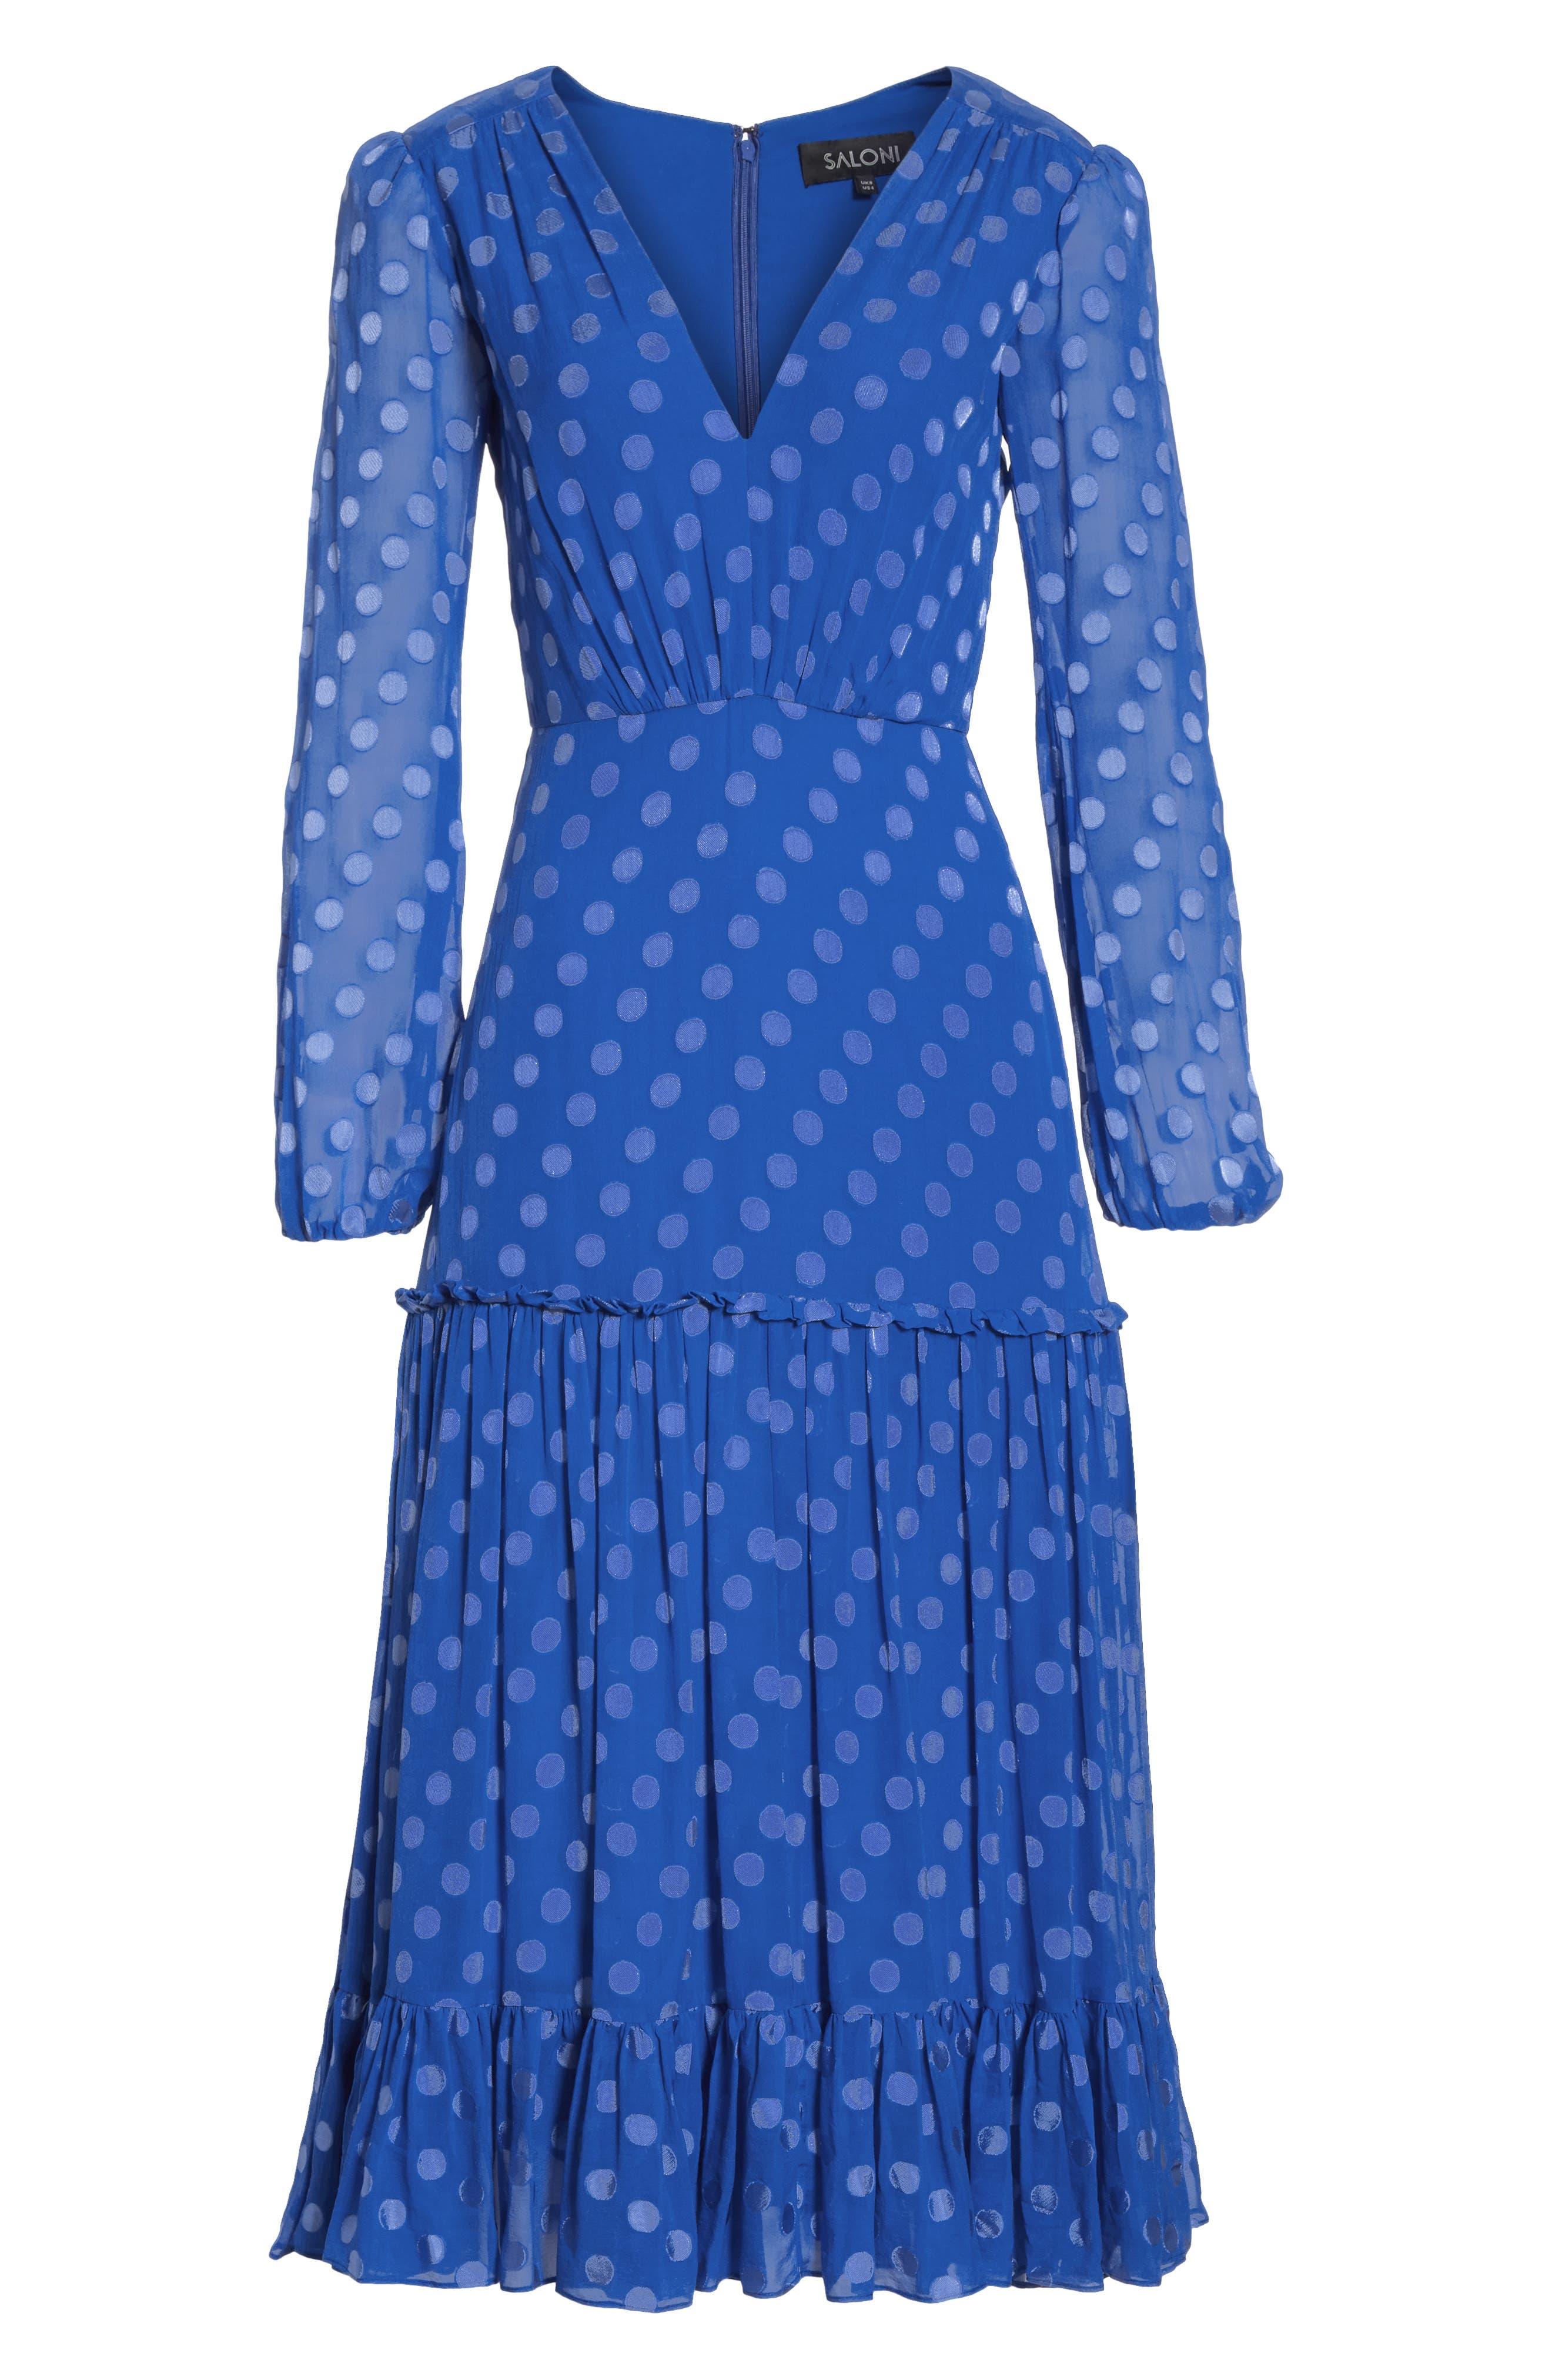 SALONI, Polka Dot Ruffle Dress, Alternate thumbnail 7, color, COBALT BLUE